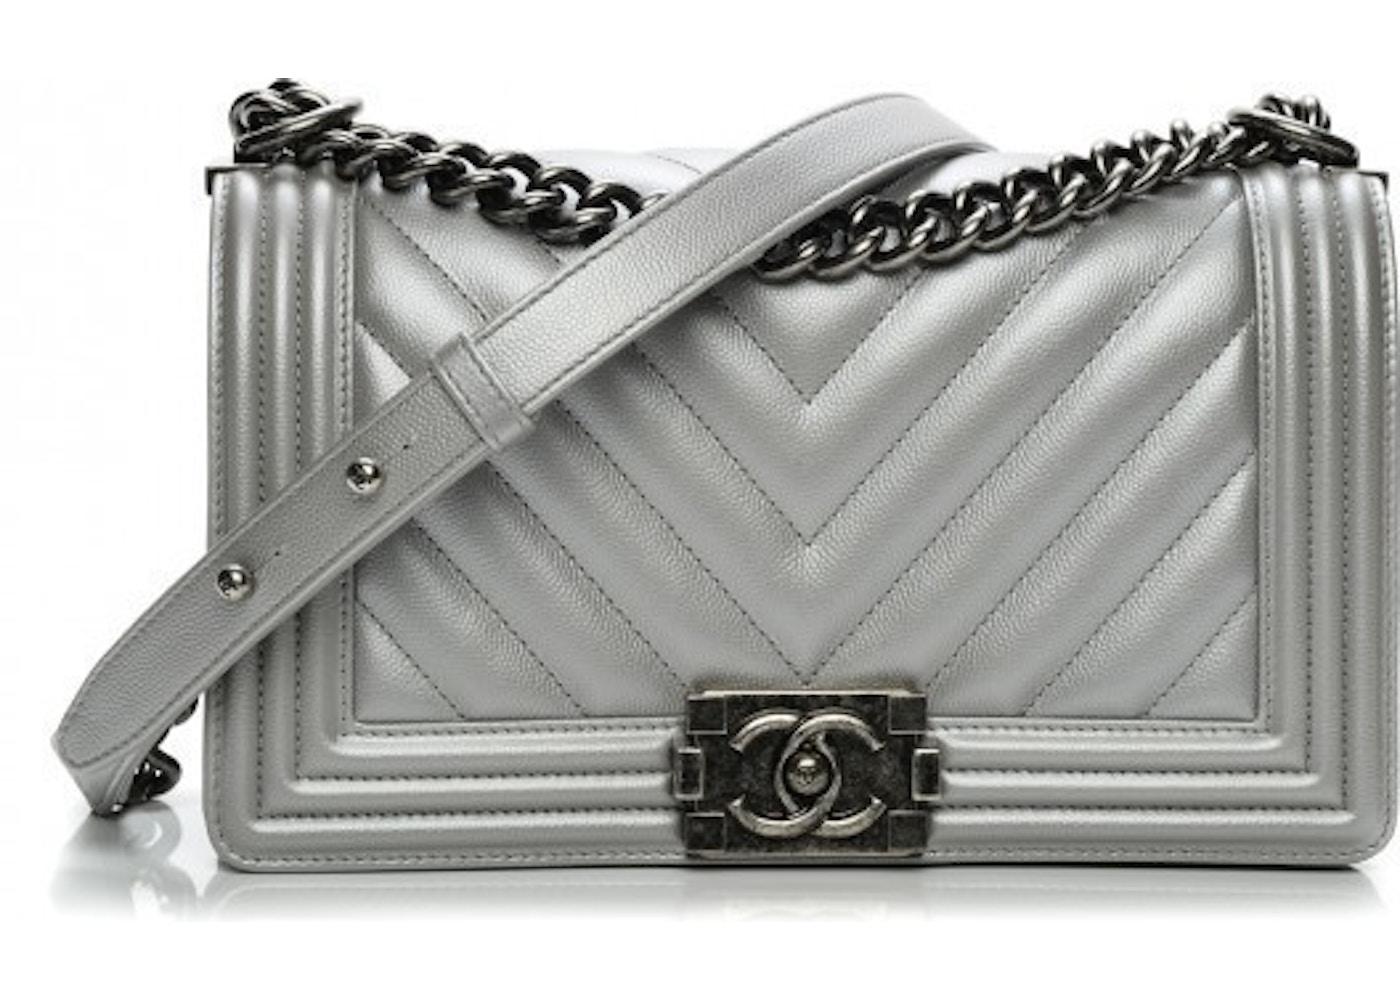 87d5a7542567f0 Chanel Boy Flap Chevron Quilted Metallic Medium Silver